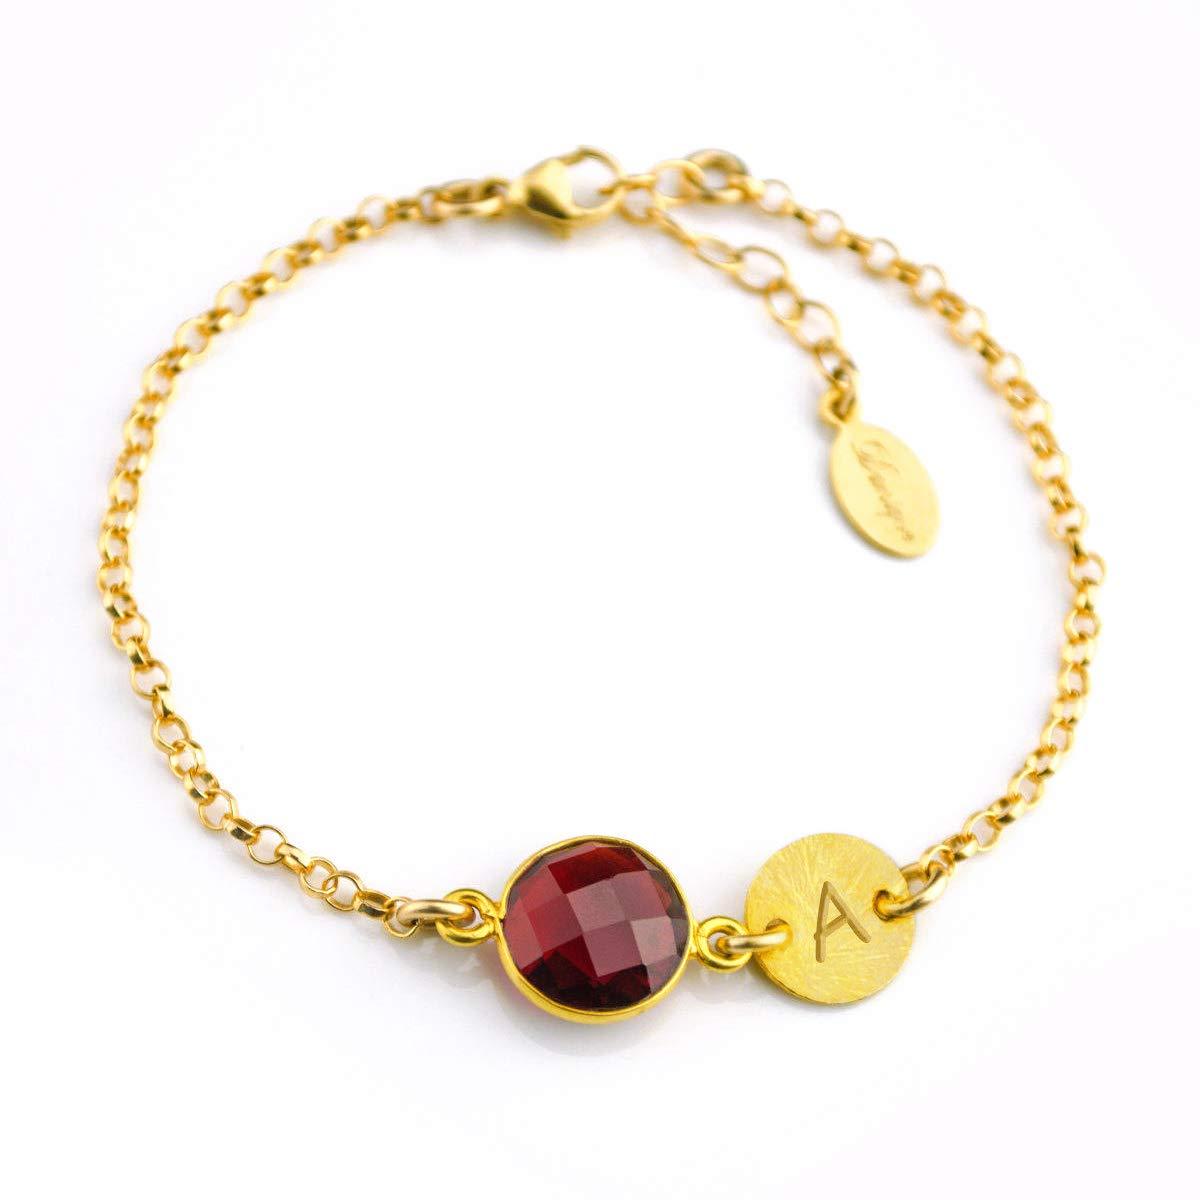 Garnet Bar Bracelet Garnet Gemstone Earring and Bracelet Set January Birthstone Earrings Birthstone Bracelet. Crystal Jewellery Set